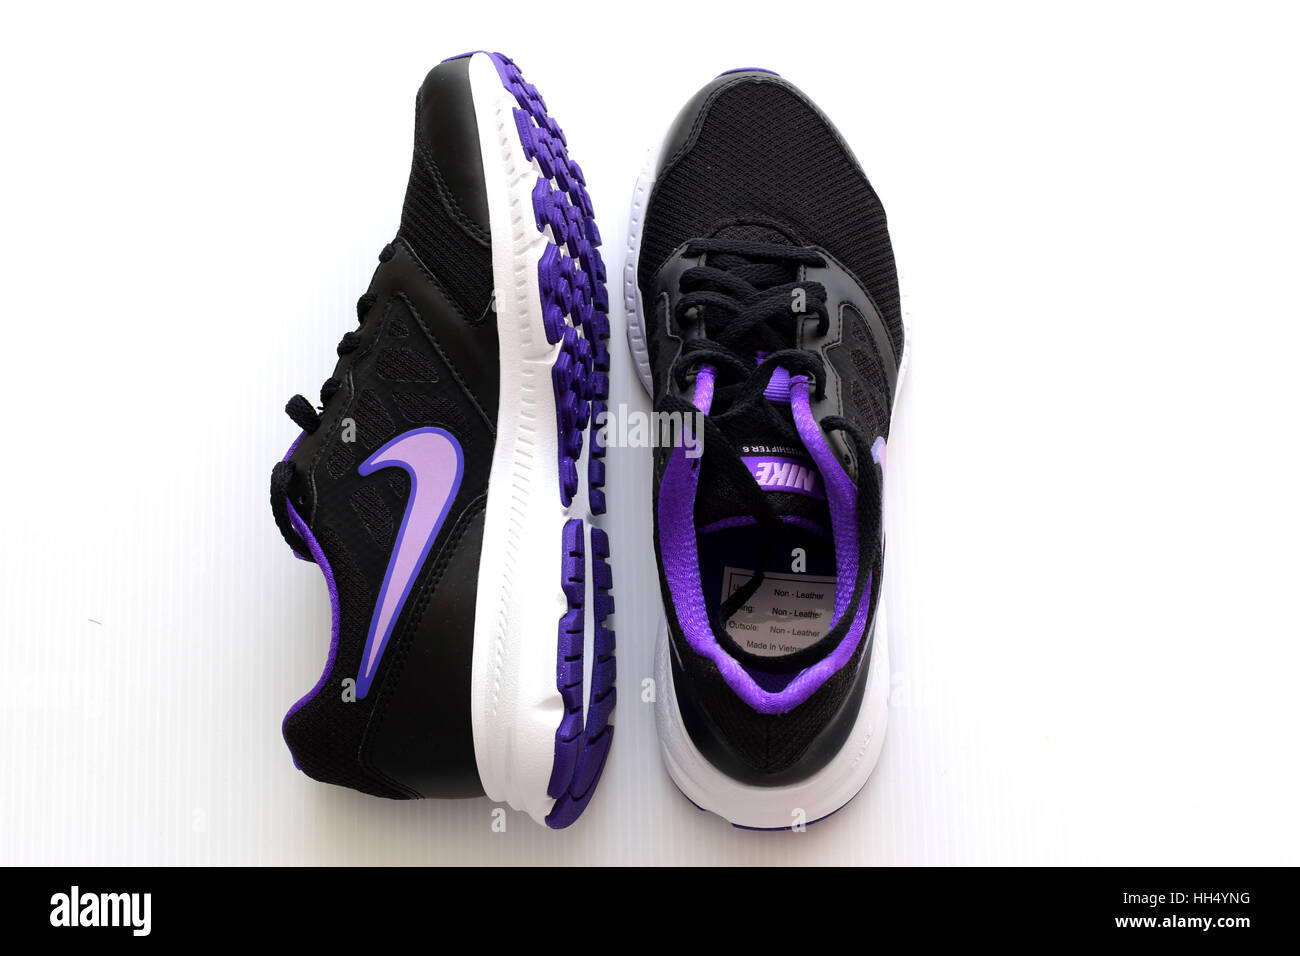 Nike Schuhe Stockfotos & Nike Schuhe Bilder Alamy